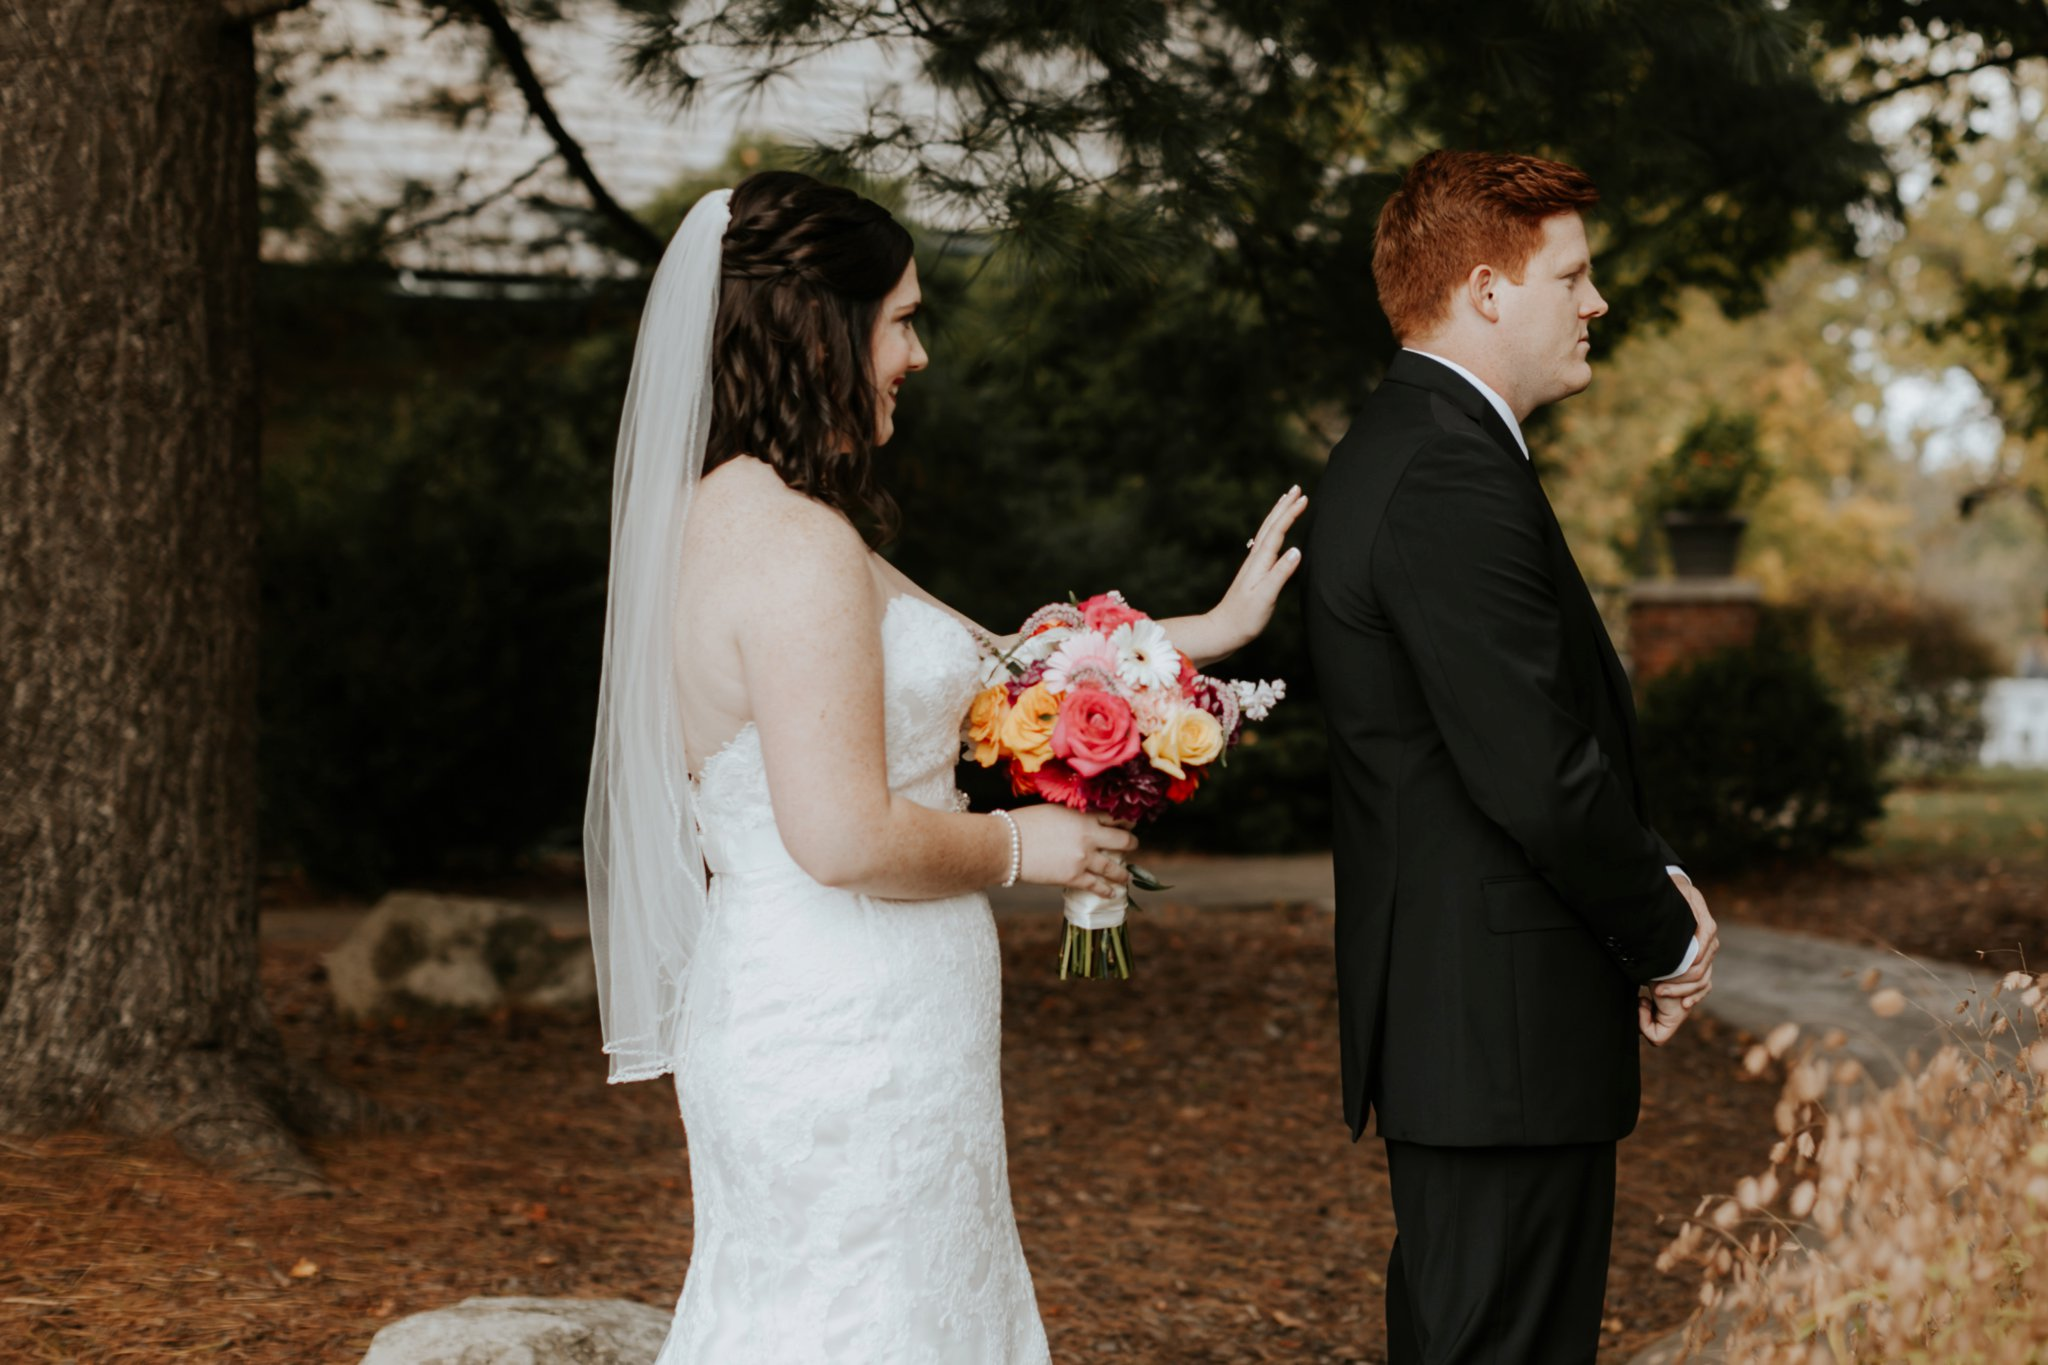 17-09-15 Lindsey and Brandon Wedding Edited-282_WEB.jpg